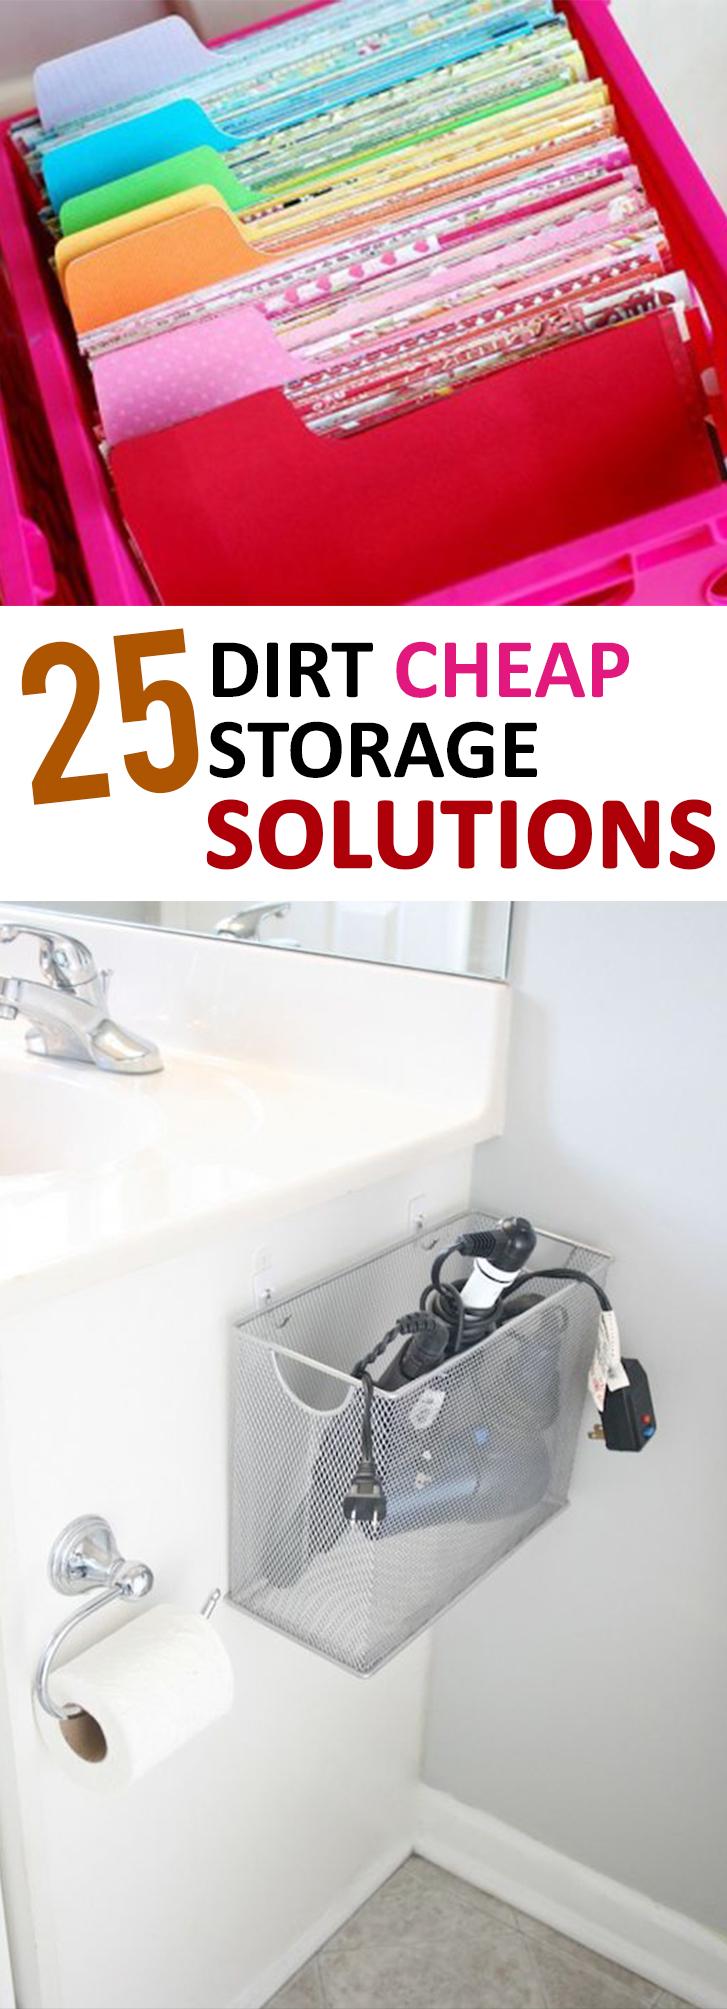 storage solutions, cheap storage ideas, DIY storage, DIY hacks, frugal organization, popular pin, organization hacks, storage ideas.